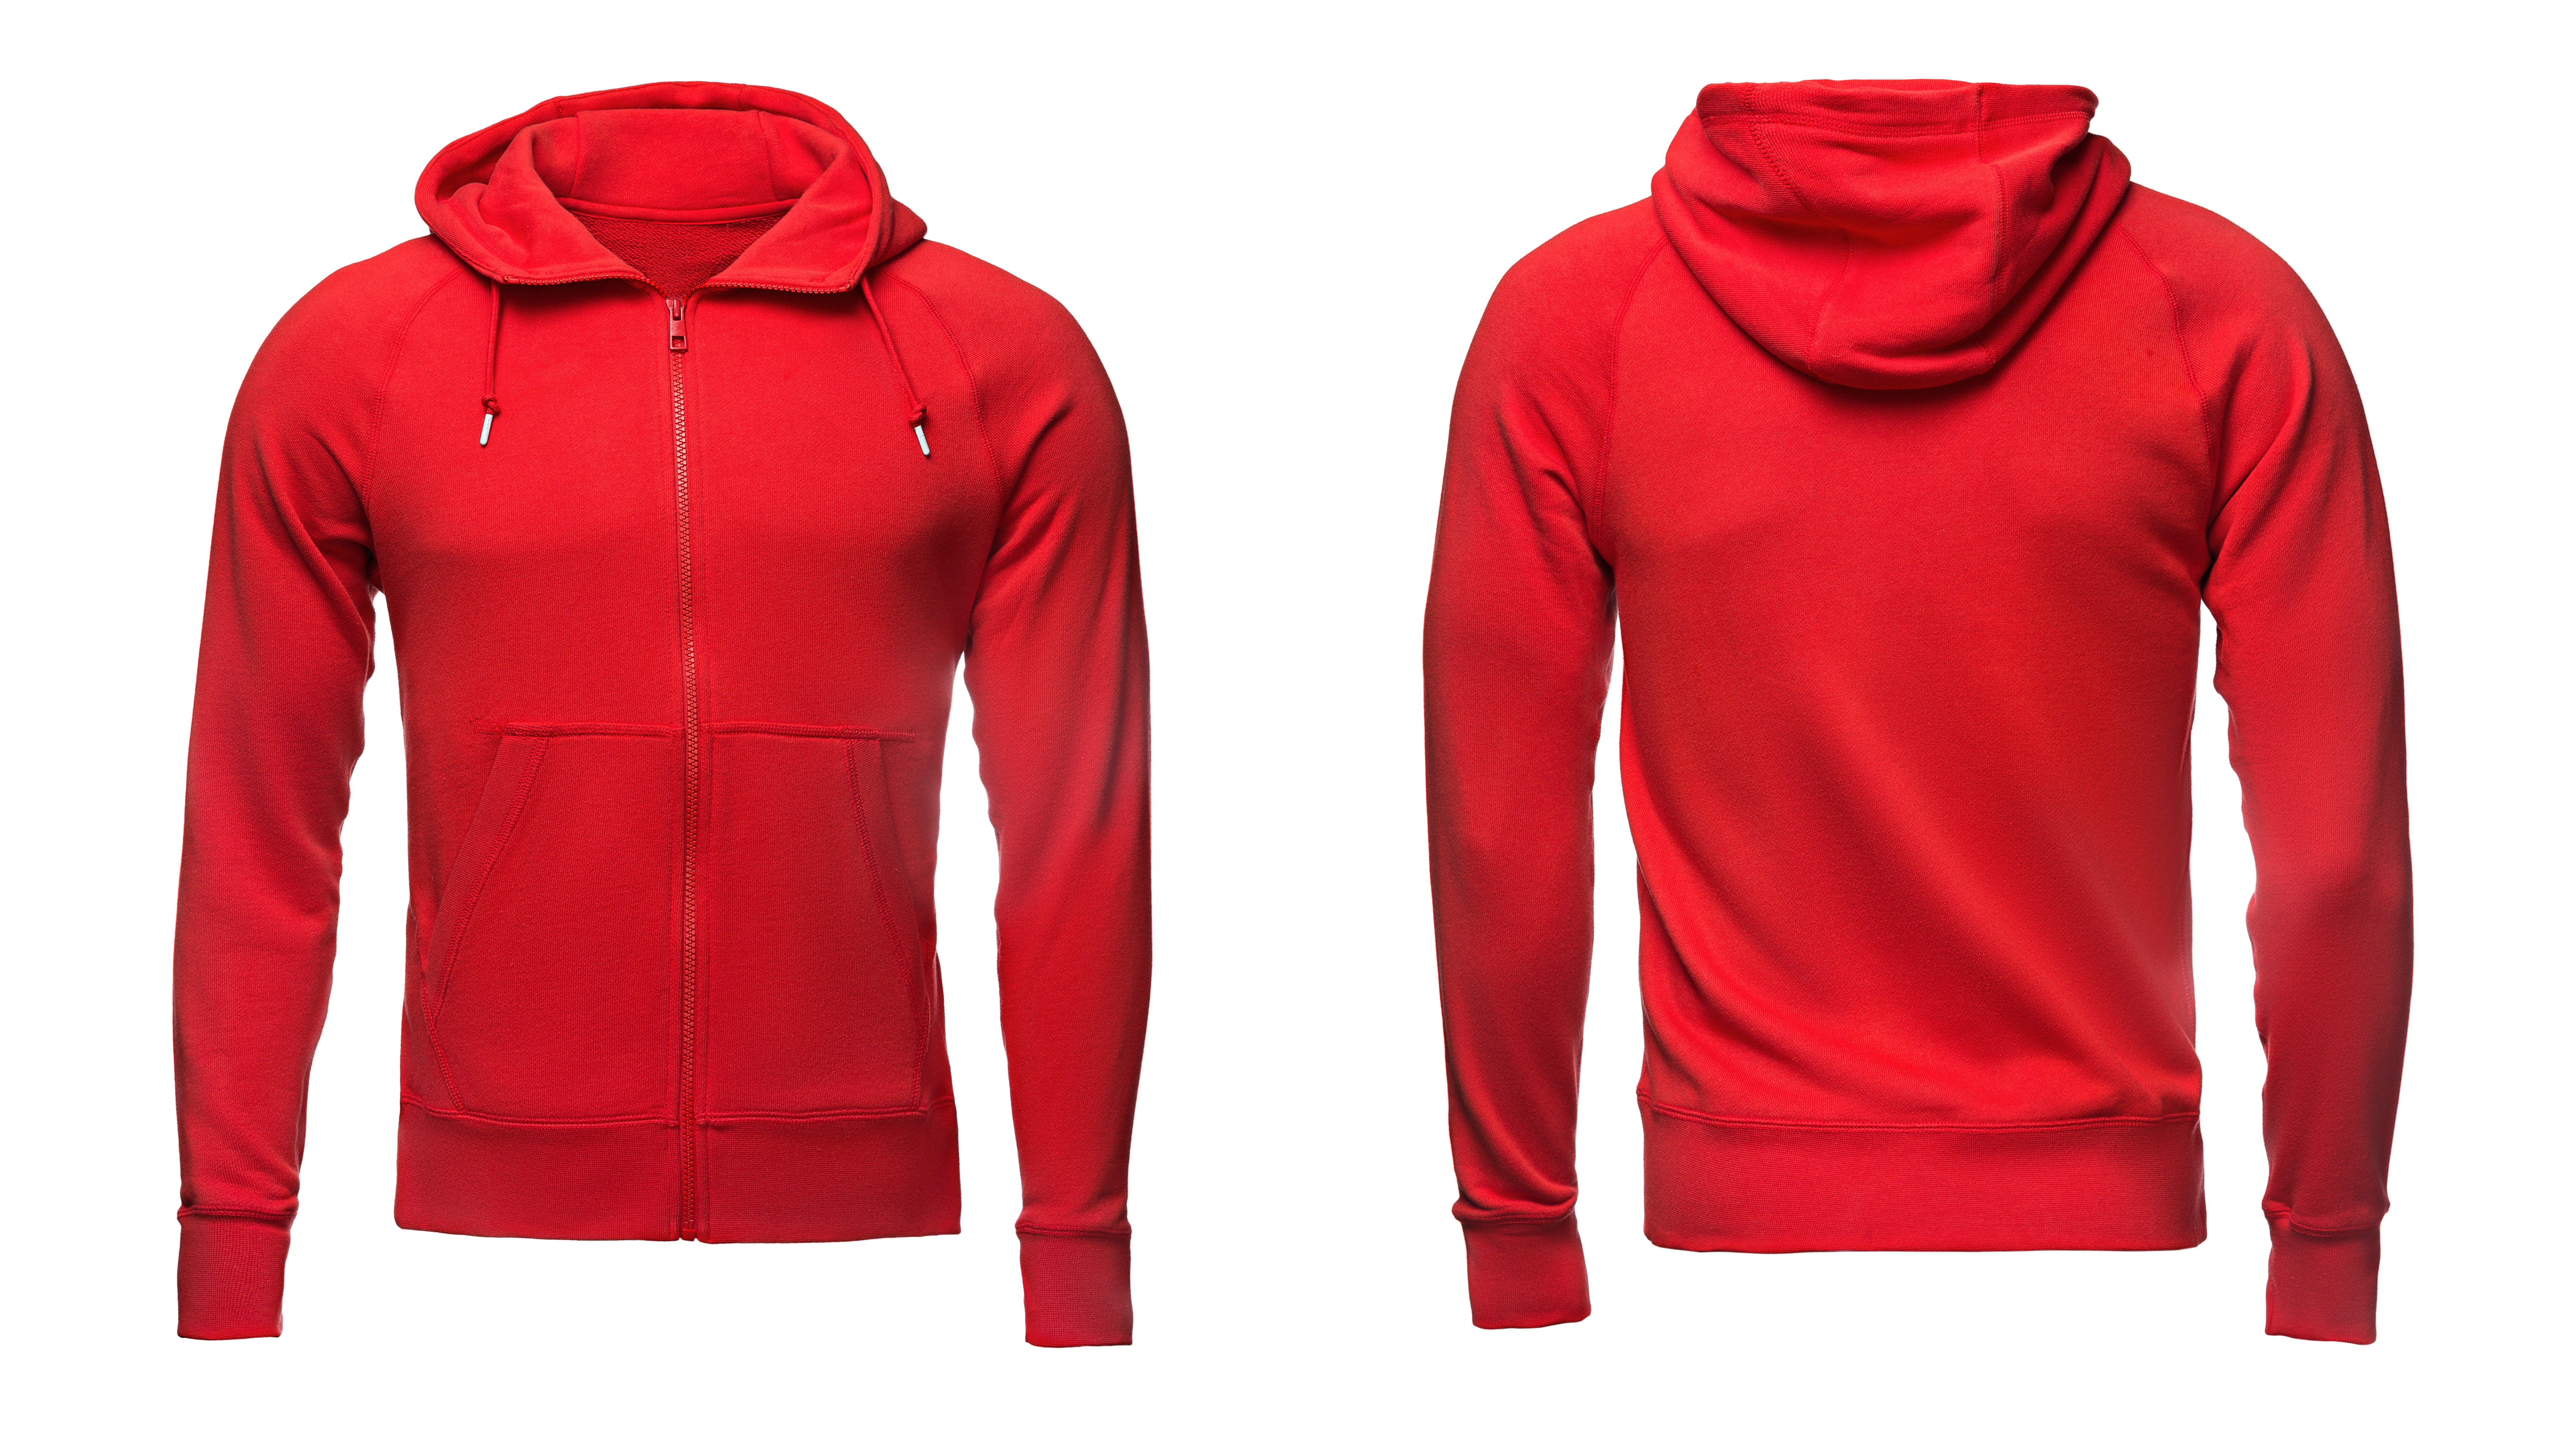 Custom made sweatshirts with hood (9)